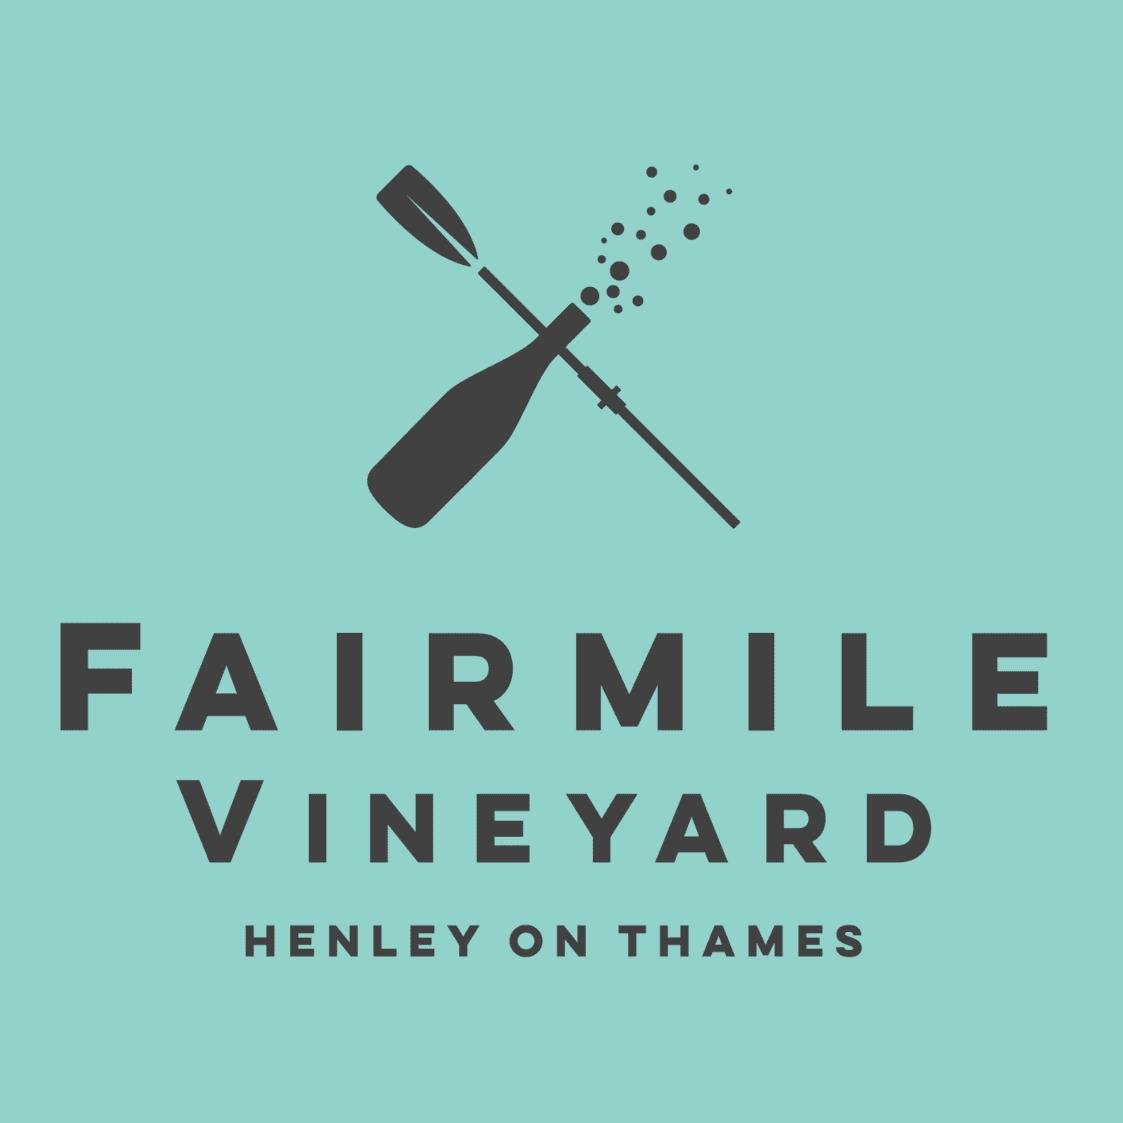 Fairmile Vineyard